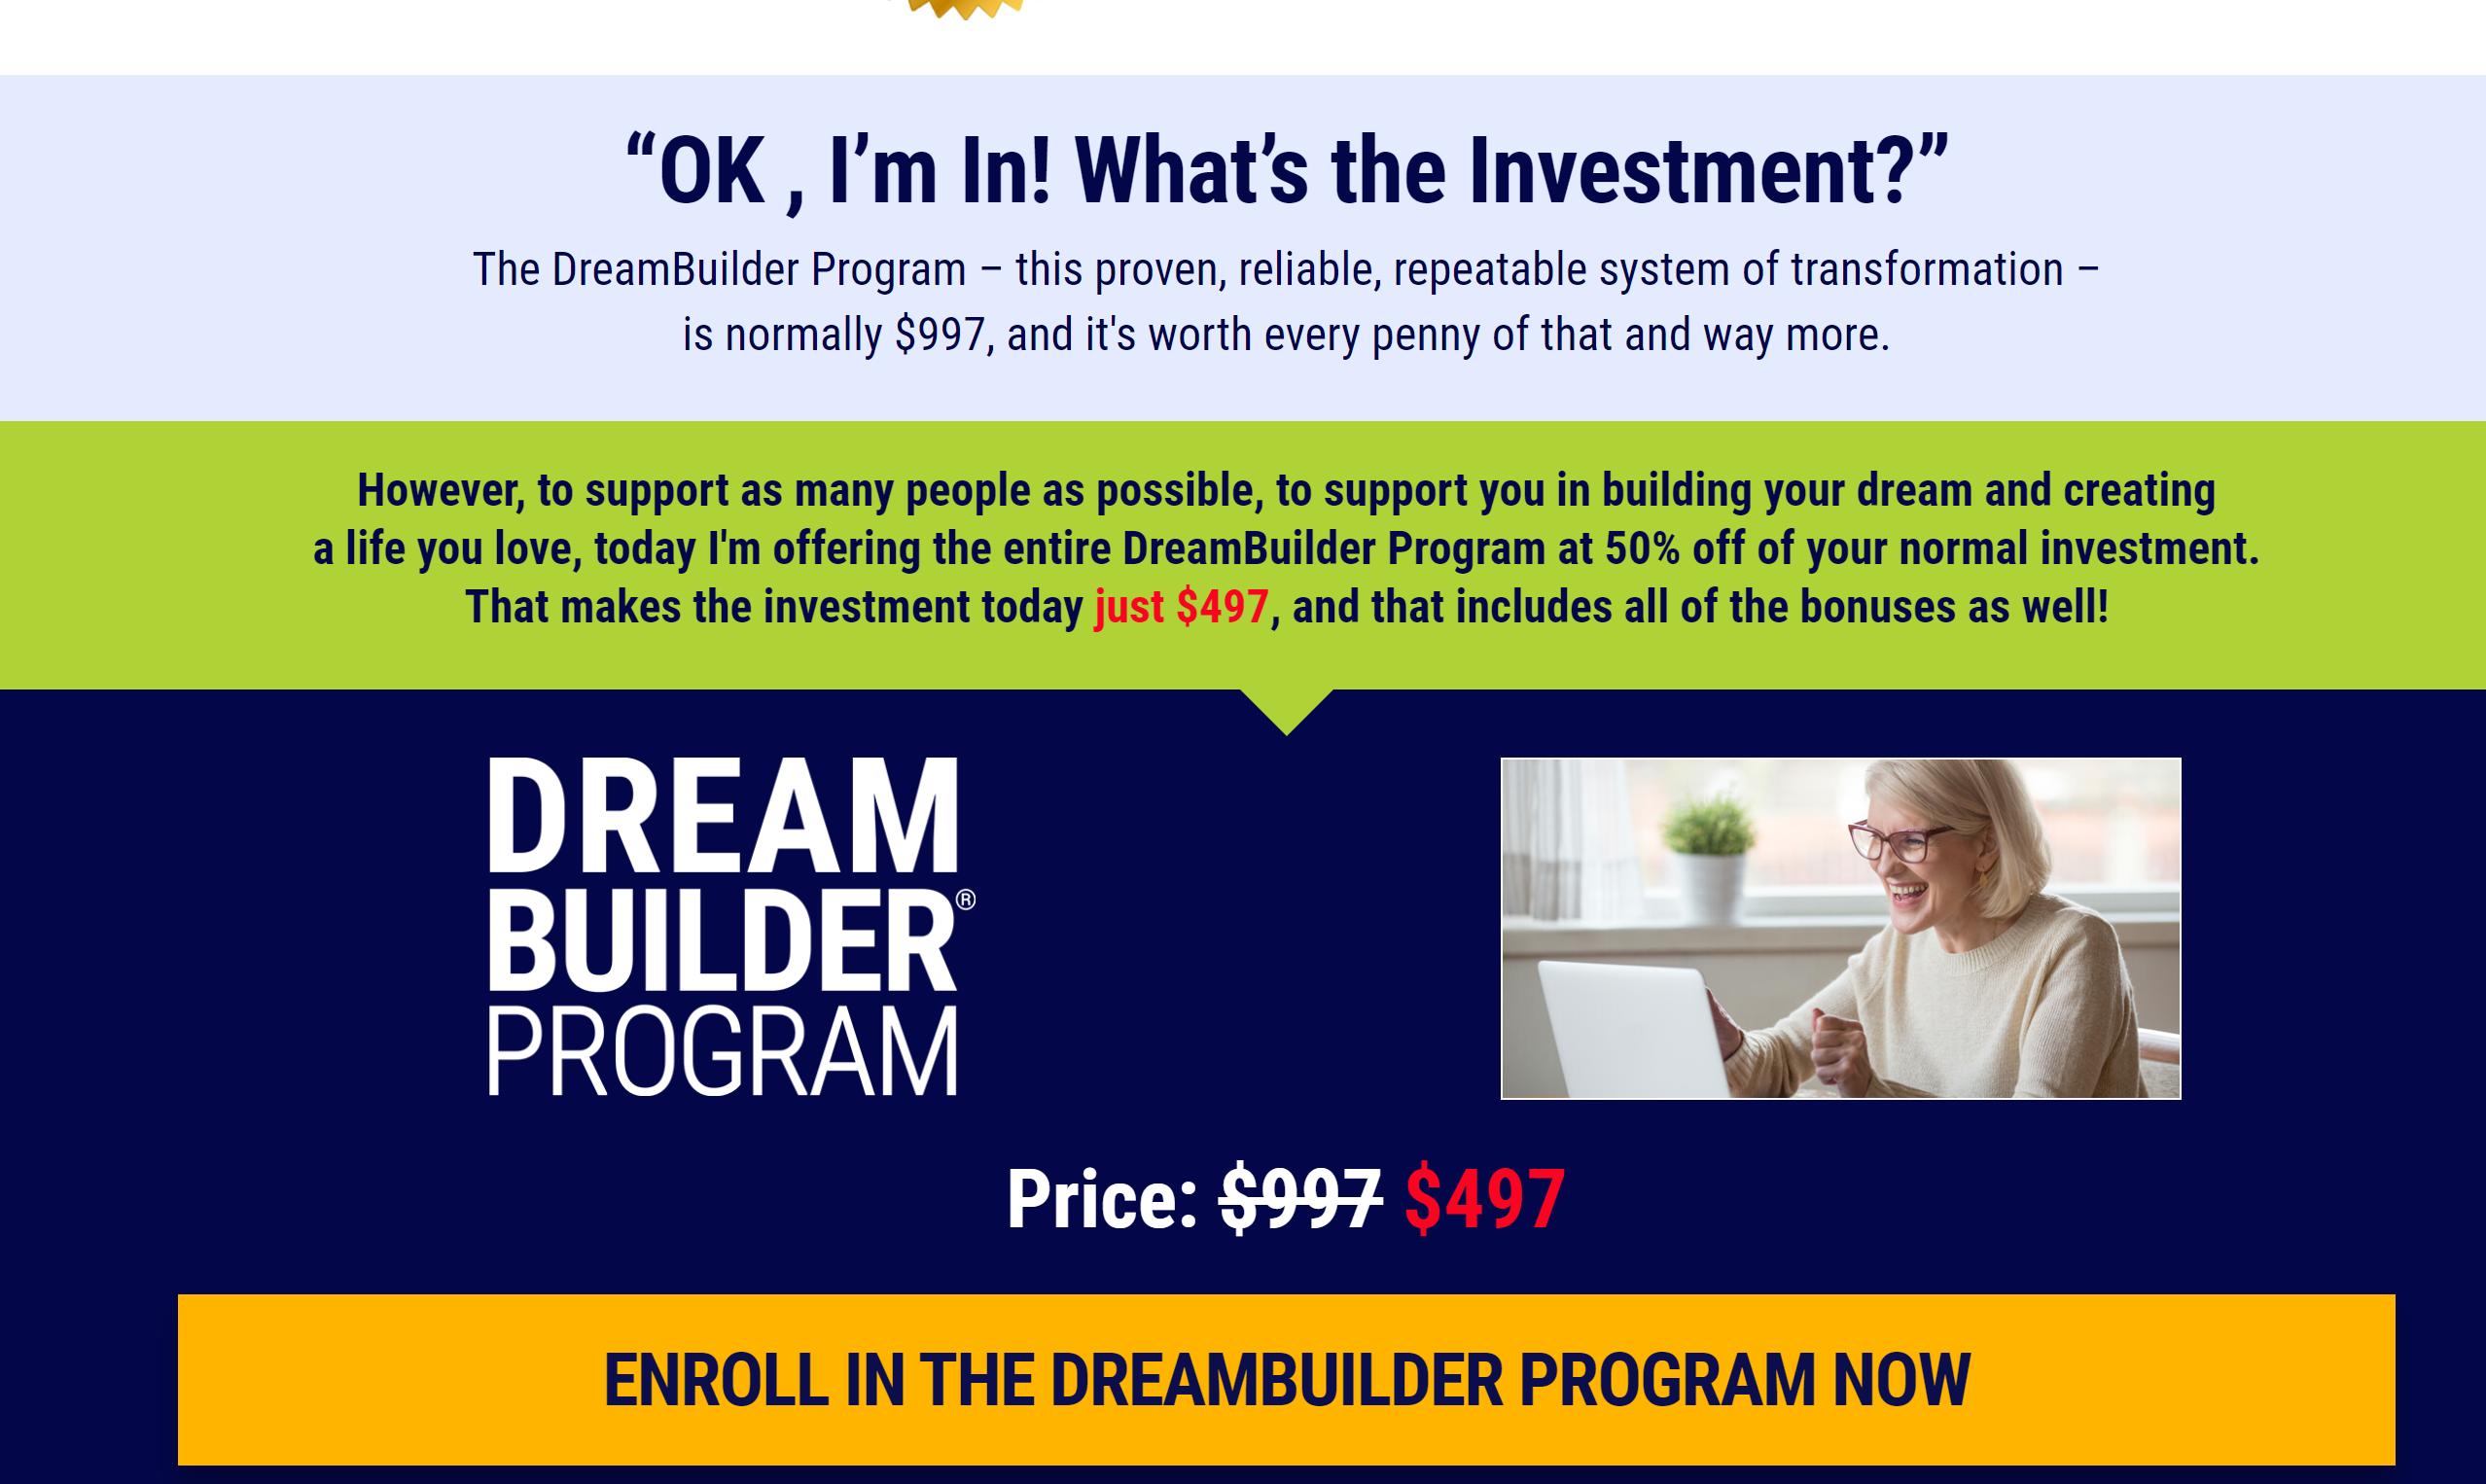 dreambuilder prrogram review online